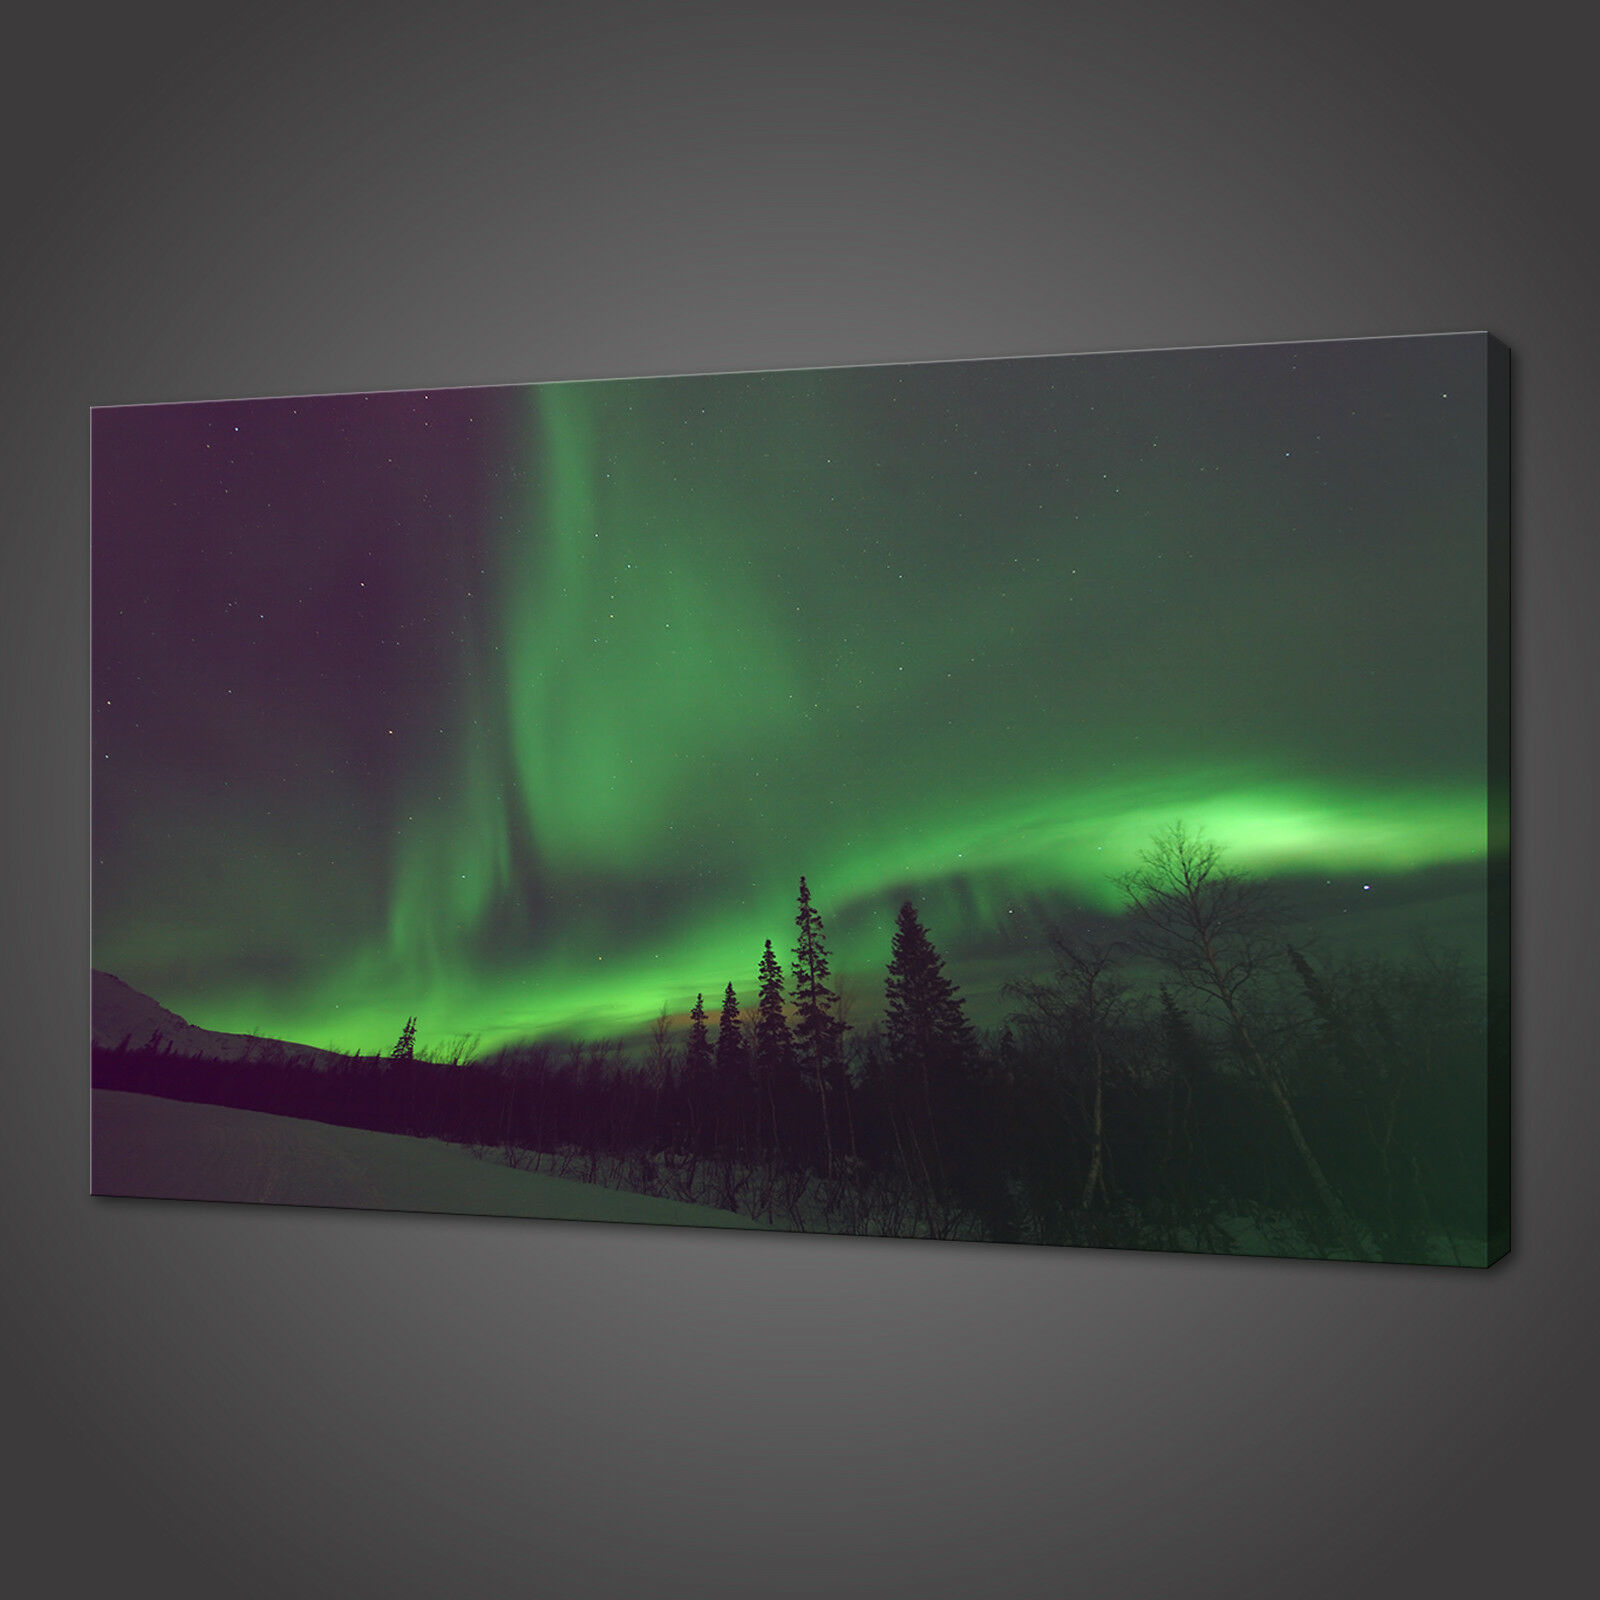 GREEB lila LIGHTS DECOR HOME ART WALL PRINT PICTURE CANVAS